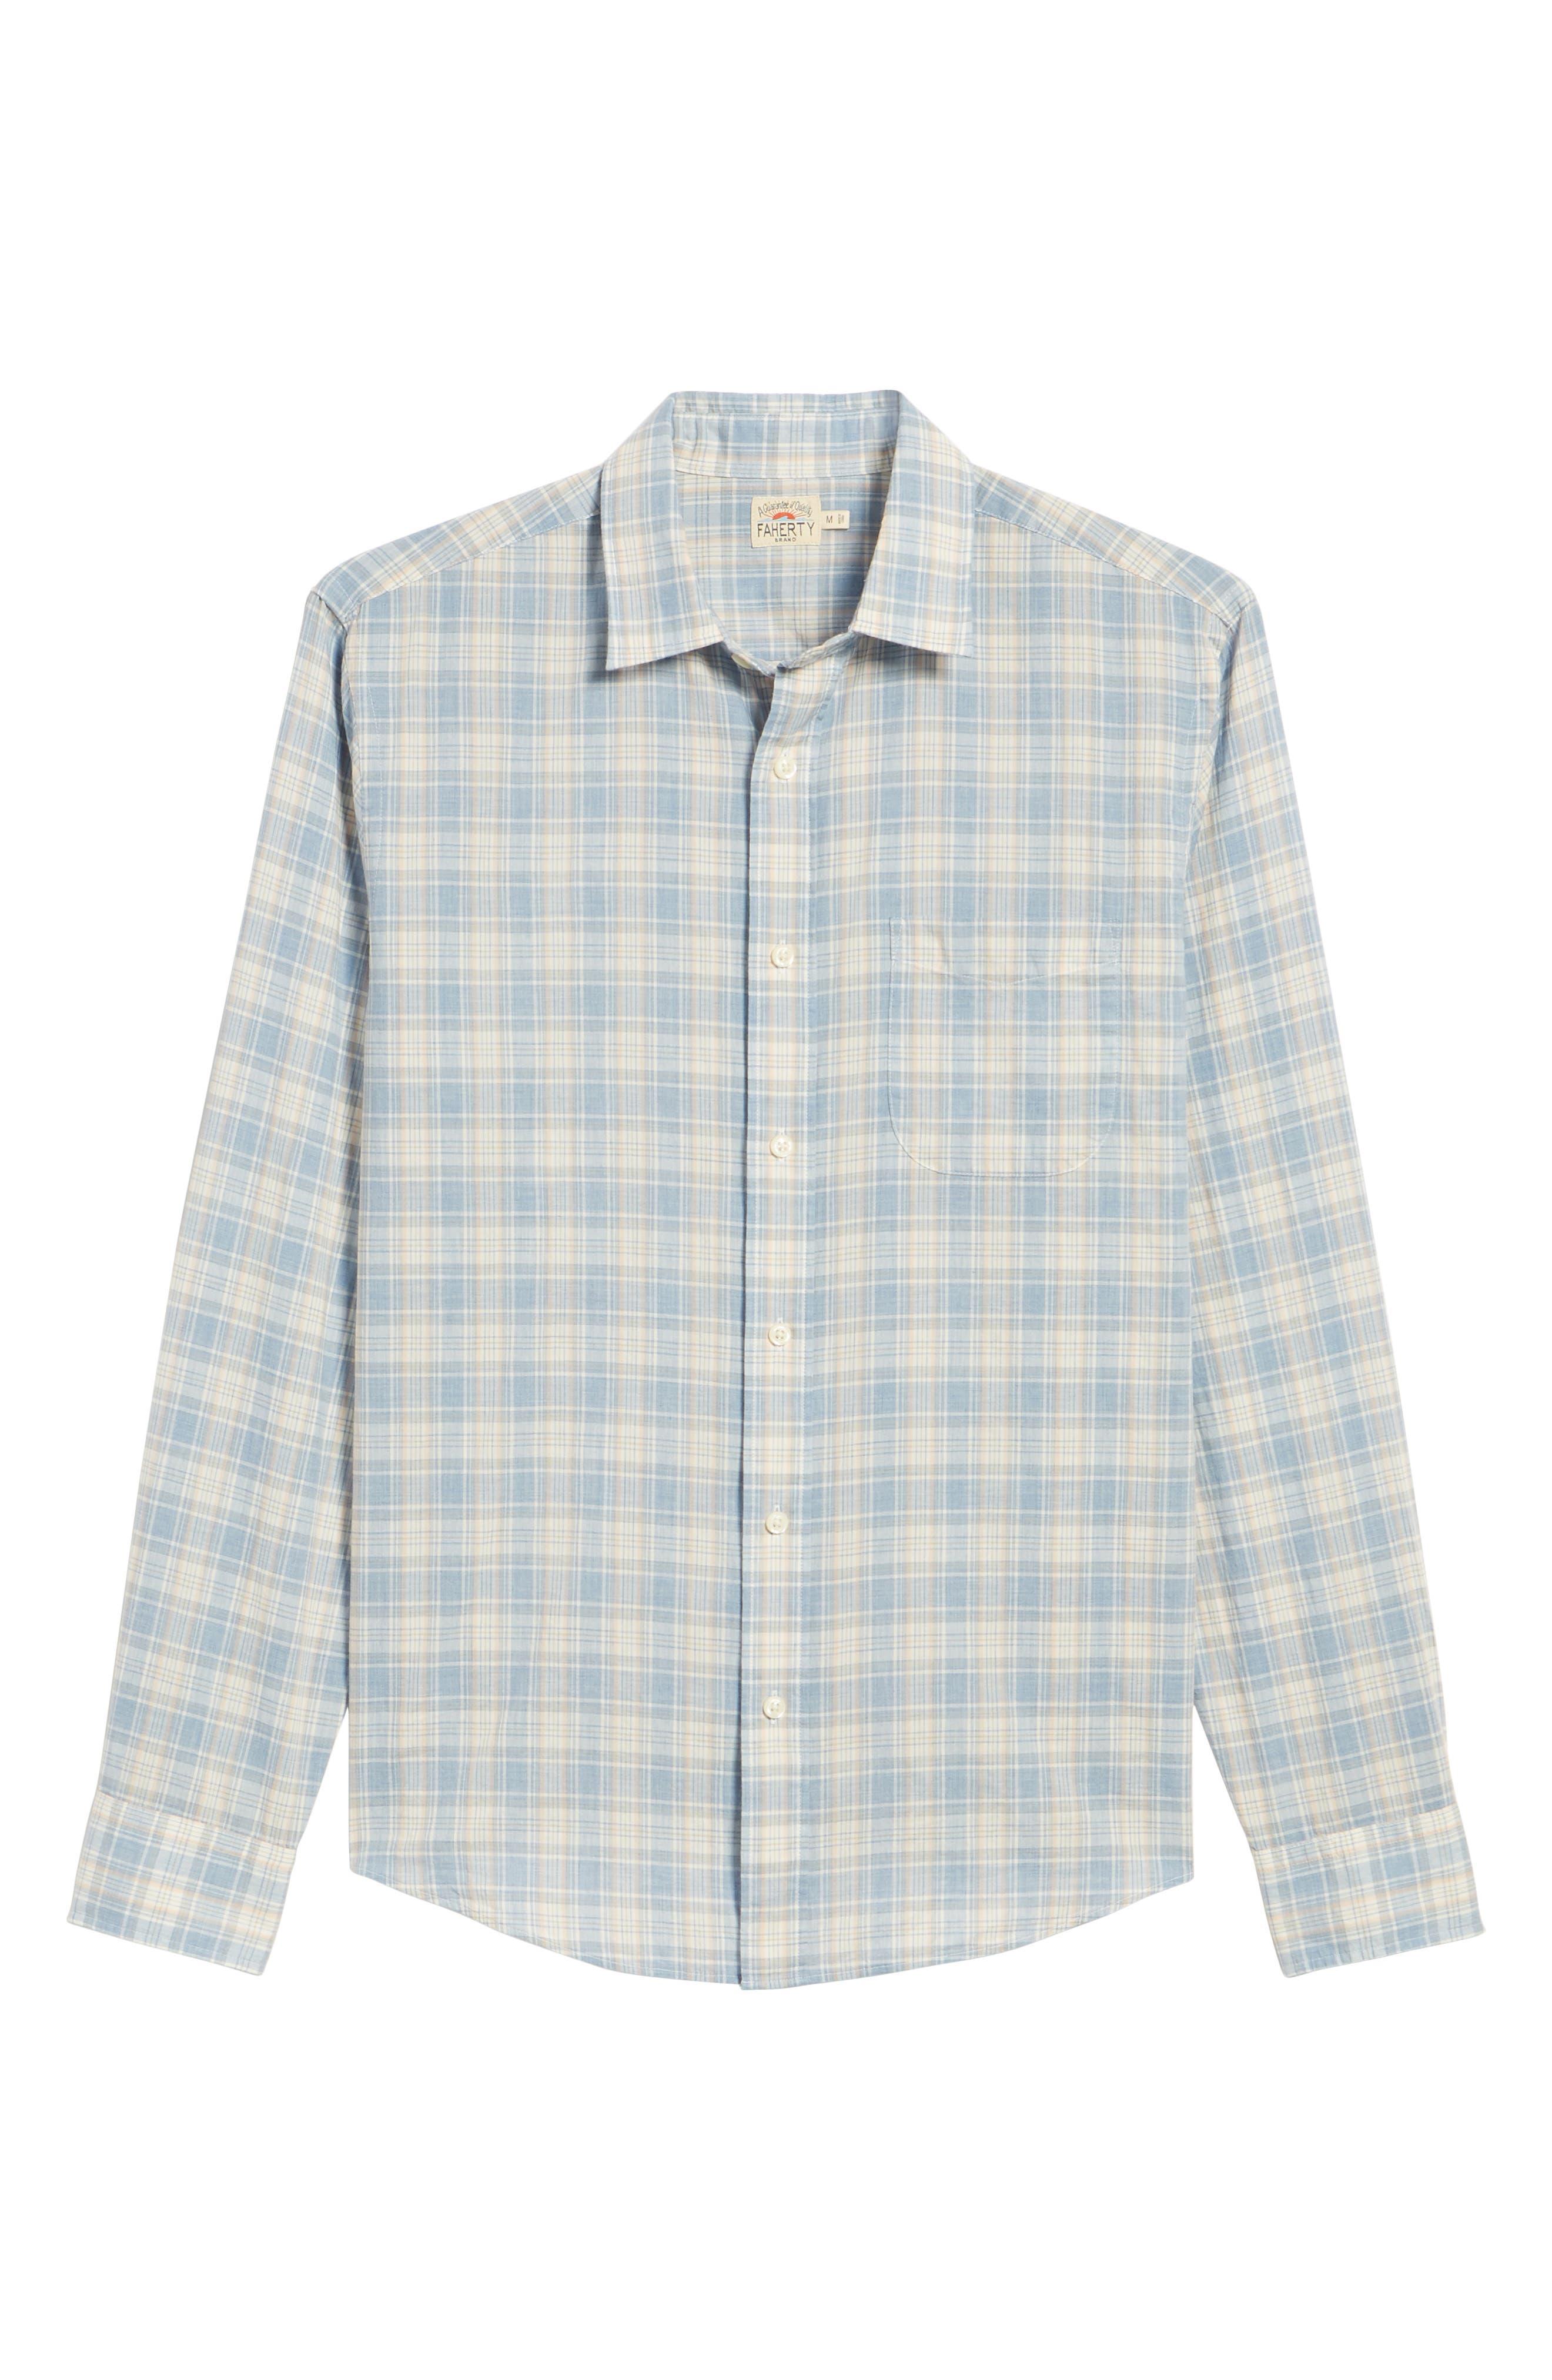 Ventura Plaid Sport Shirt,                             Alternate thumbnail 6, color,                             BLUE CORAL GREY